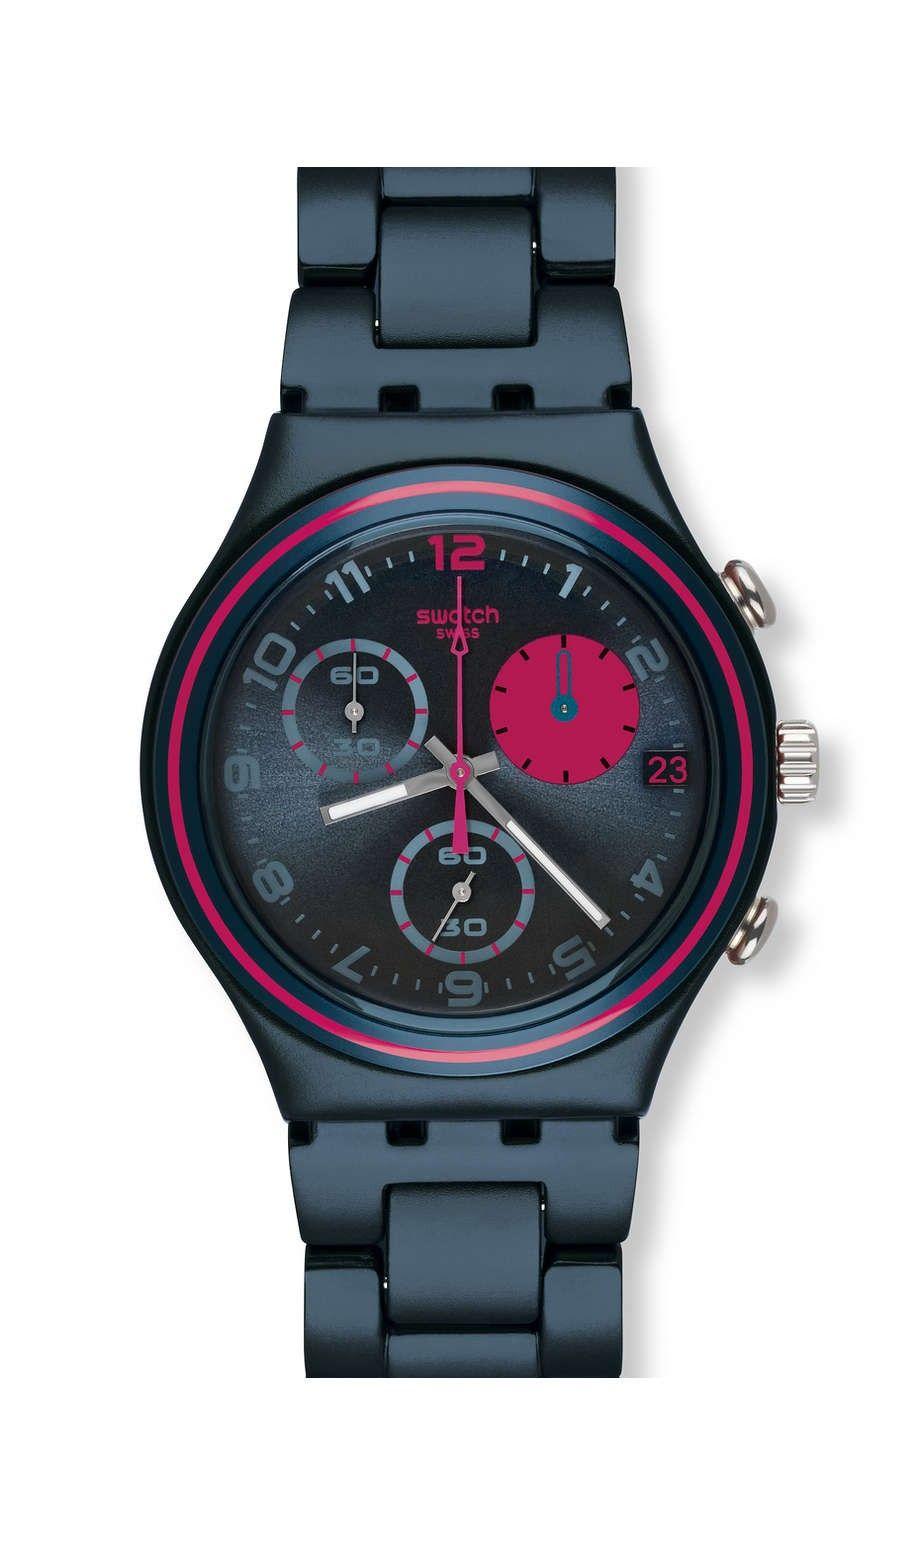 2f0cf0b004b2 Swatch Watch US Online Store - FUCHSIA CIRCLE - YCN4007AG